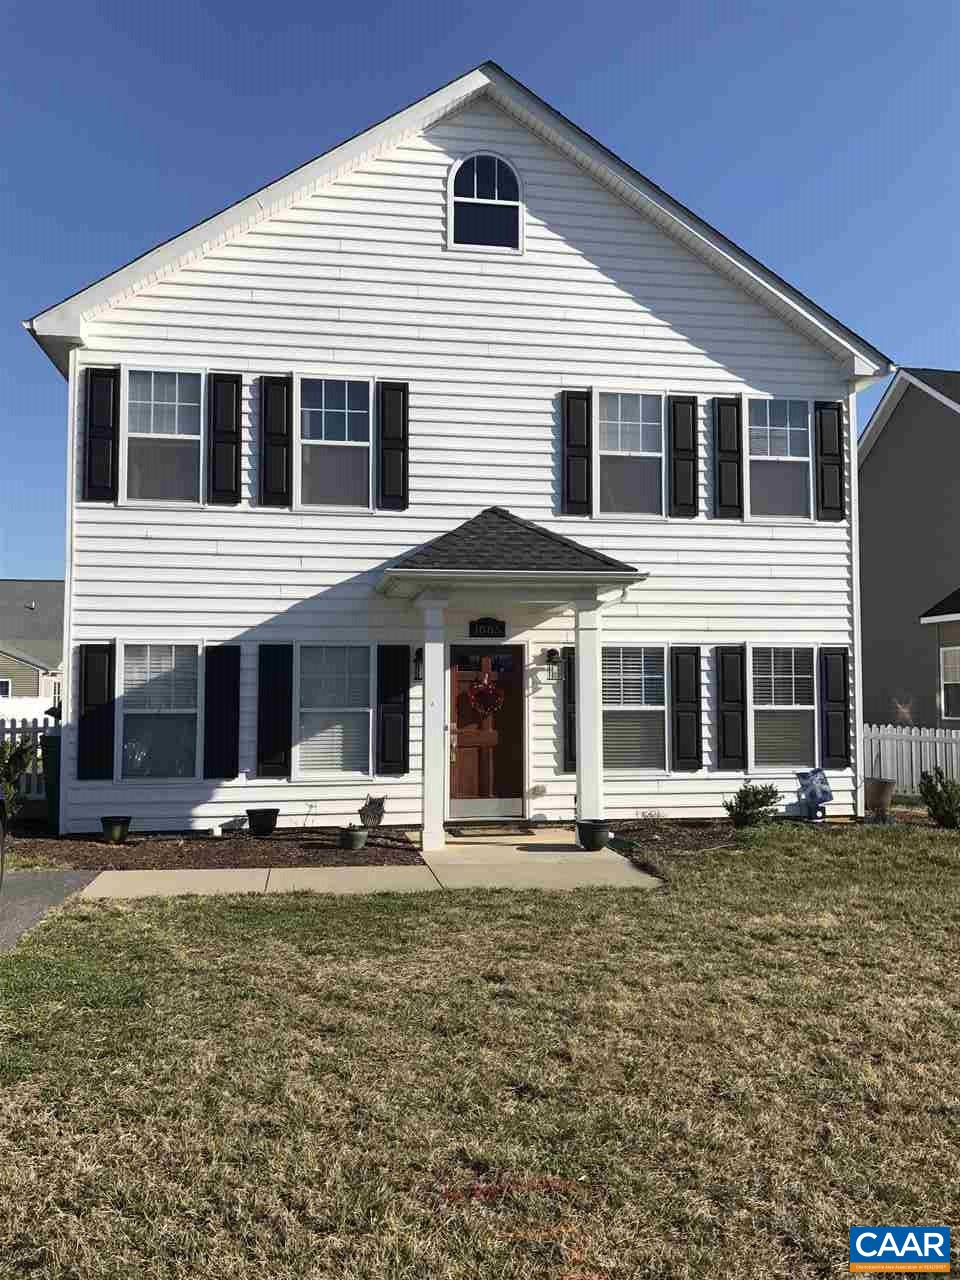 Single Family Home for Sale at 1085 PENDLETON Drive 1085 PENDLETON Drive Waynesboro, Virginia 22980 United States